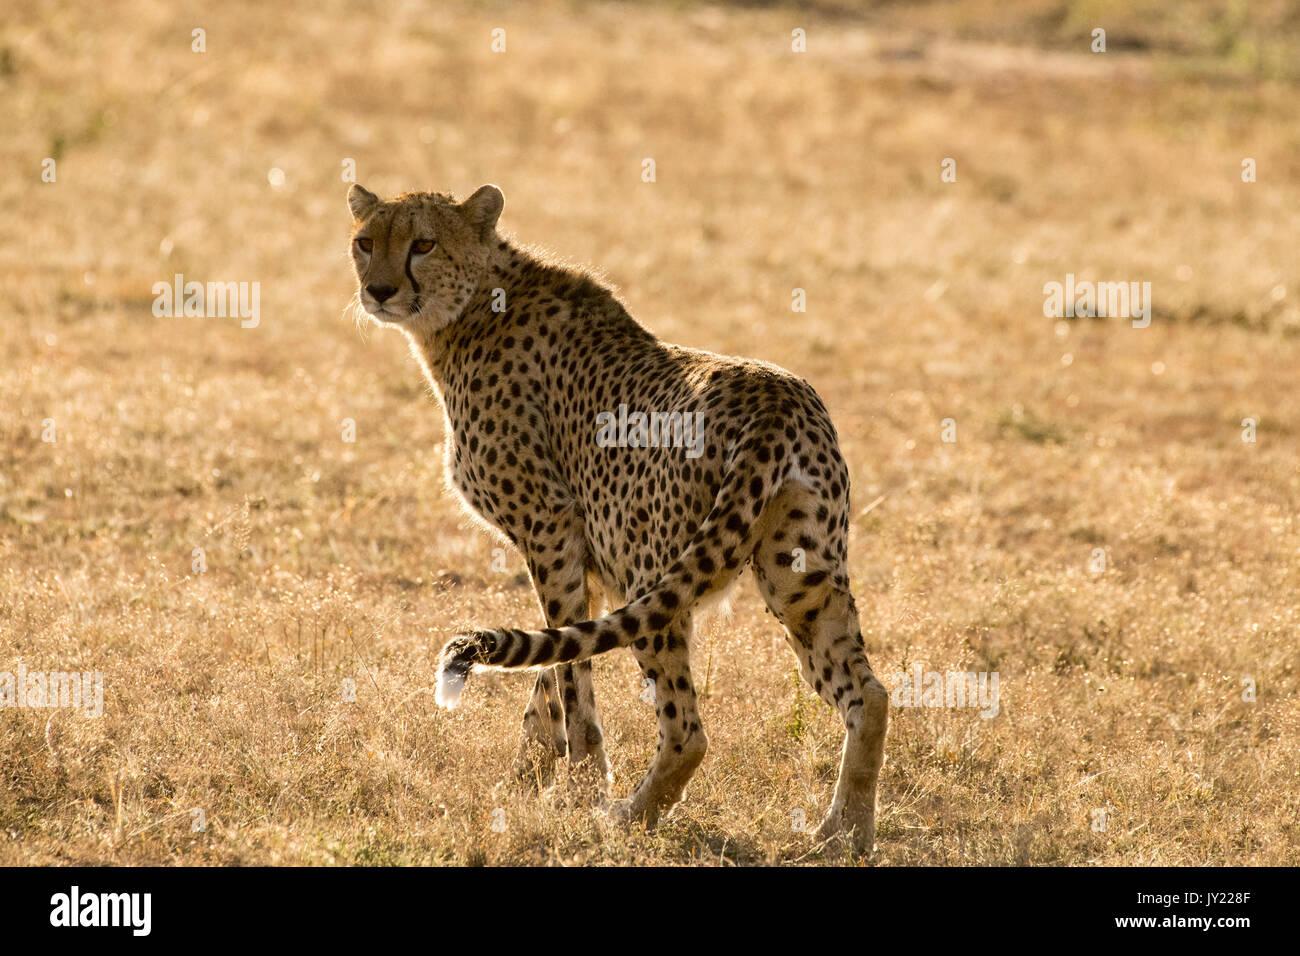 Gepardin wandern in der Masai Mara in Kenia Stockbild